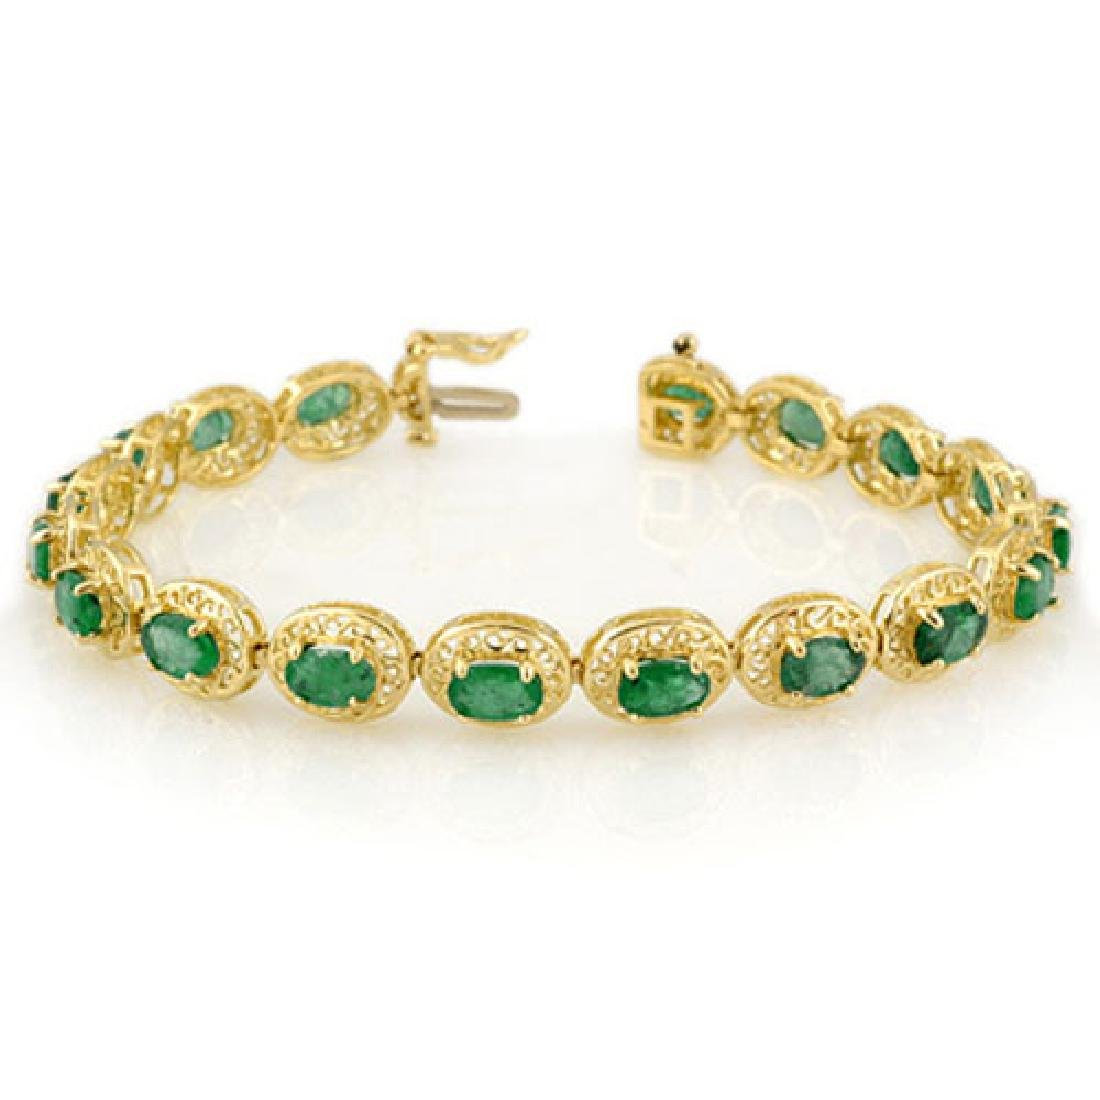 10.0 CTW Emerald Bracelet 10K Yellow Gold